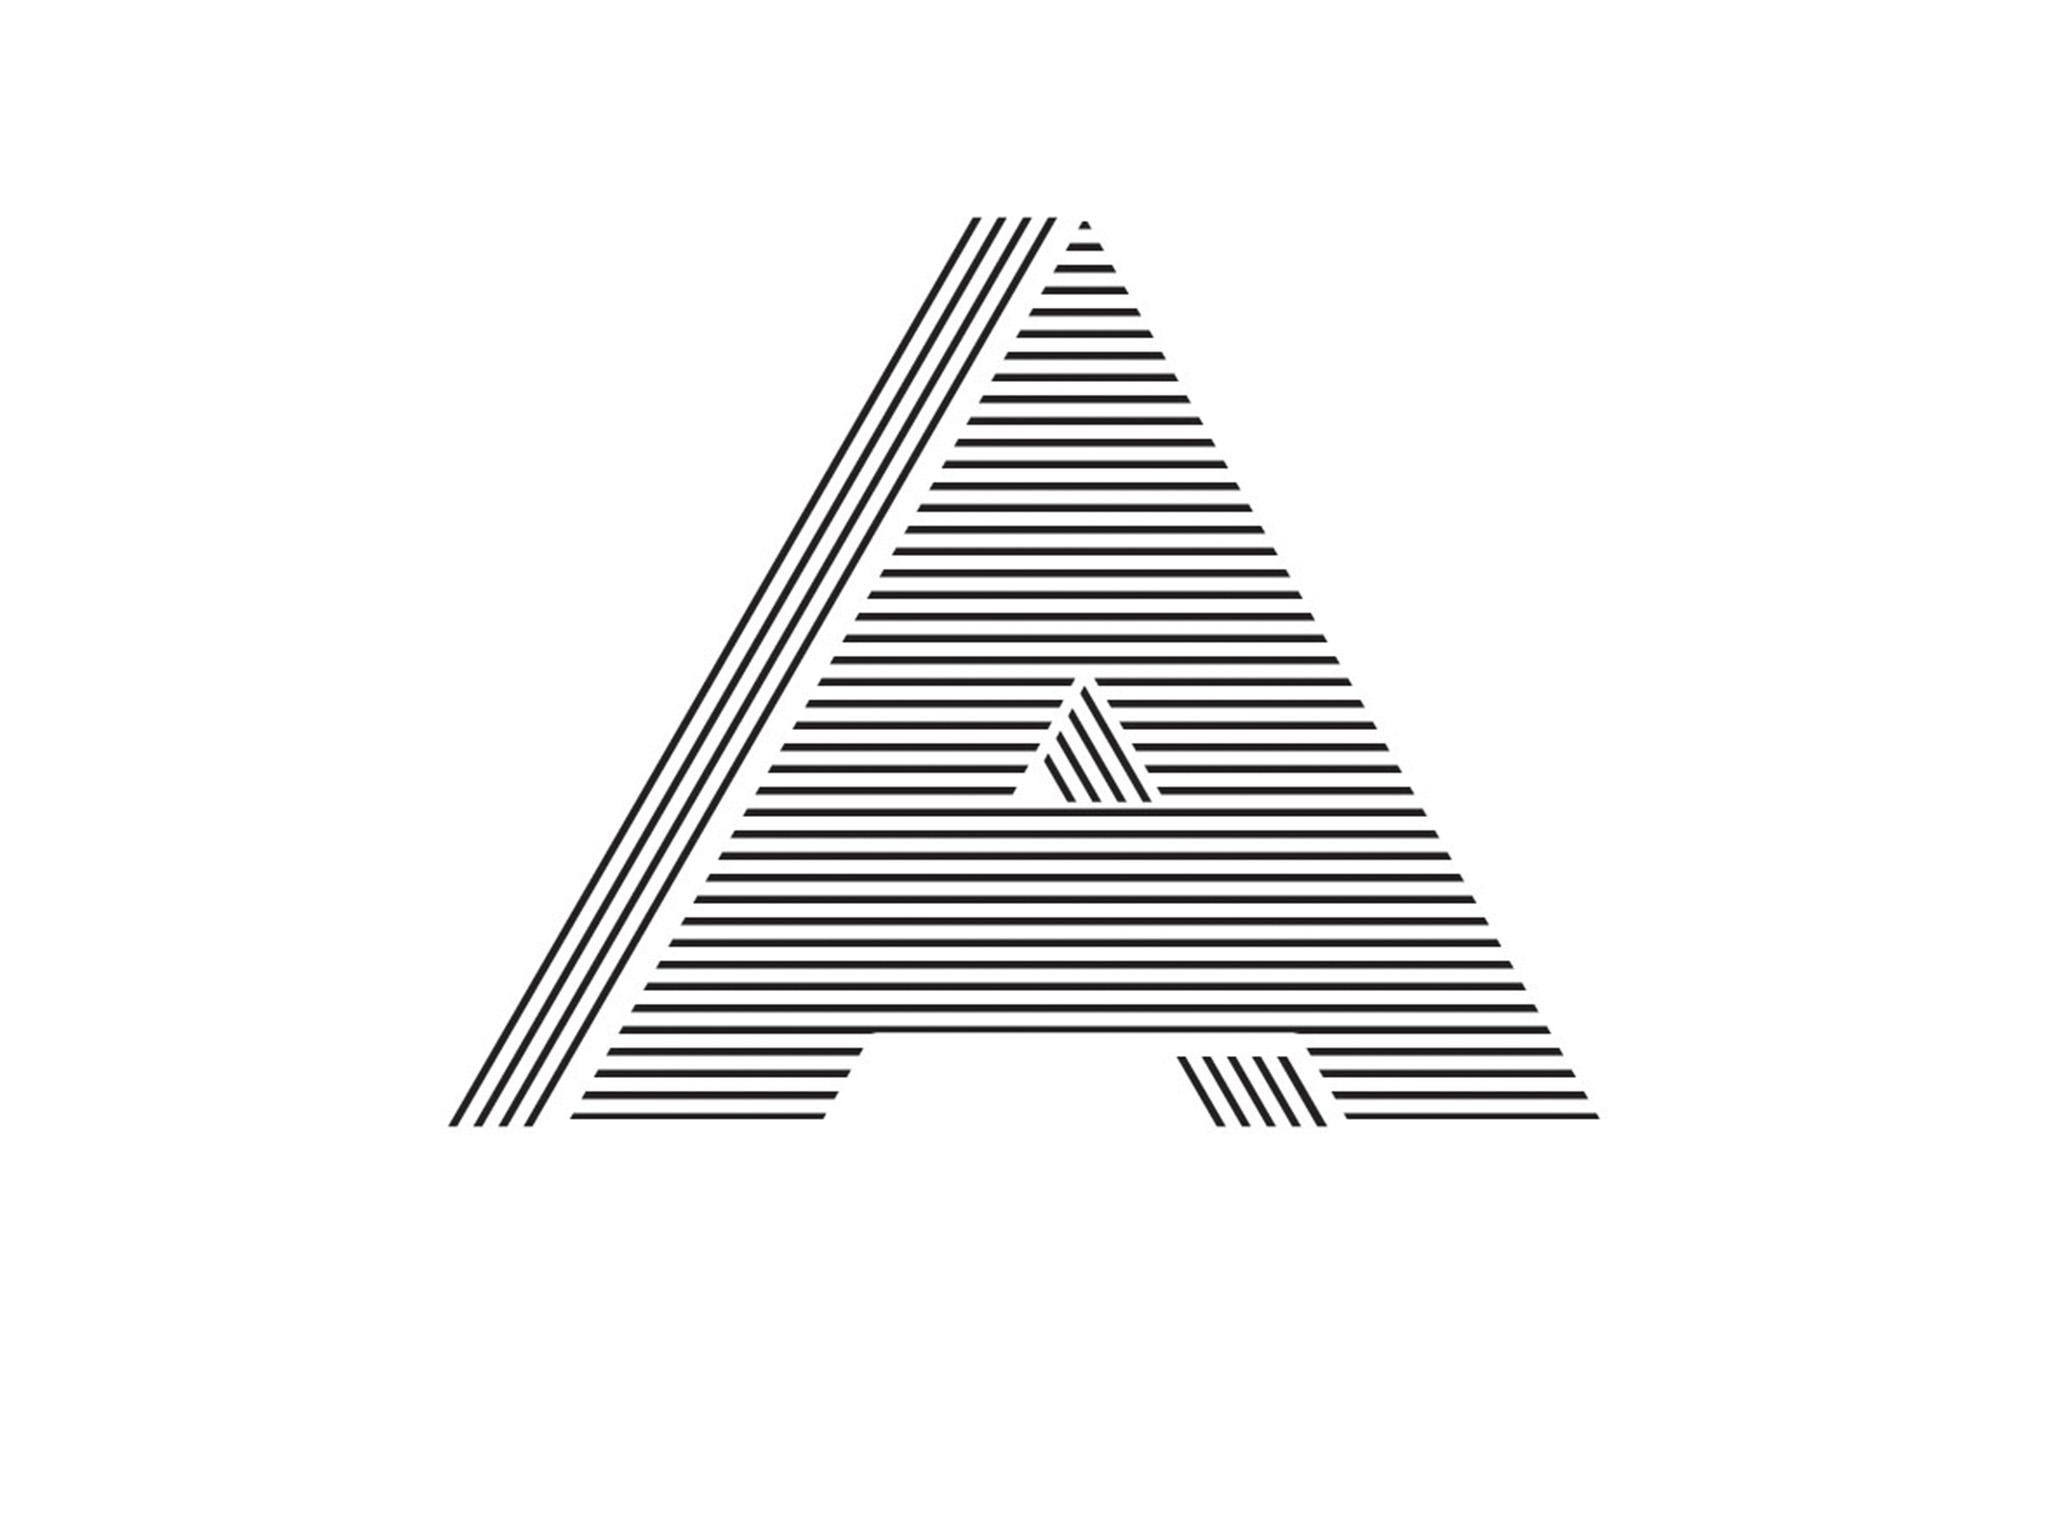 apex_letters_horizontal_large_0011_2_final_alphabet coasters-01.jpg